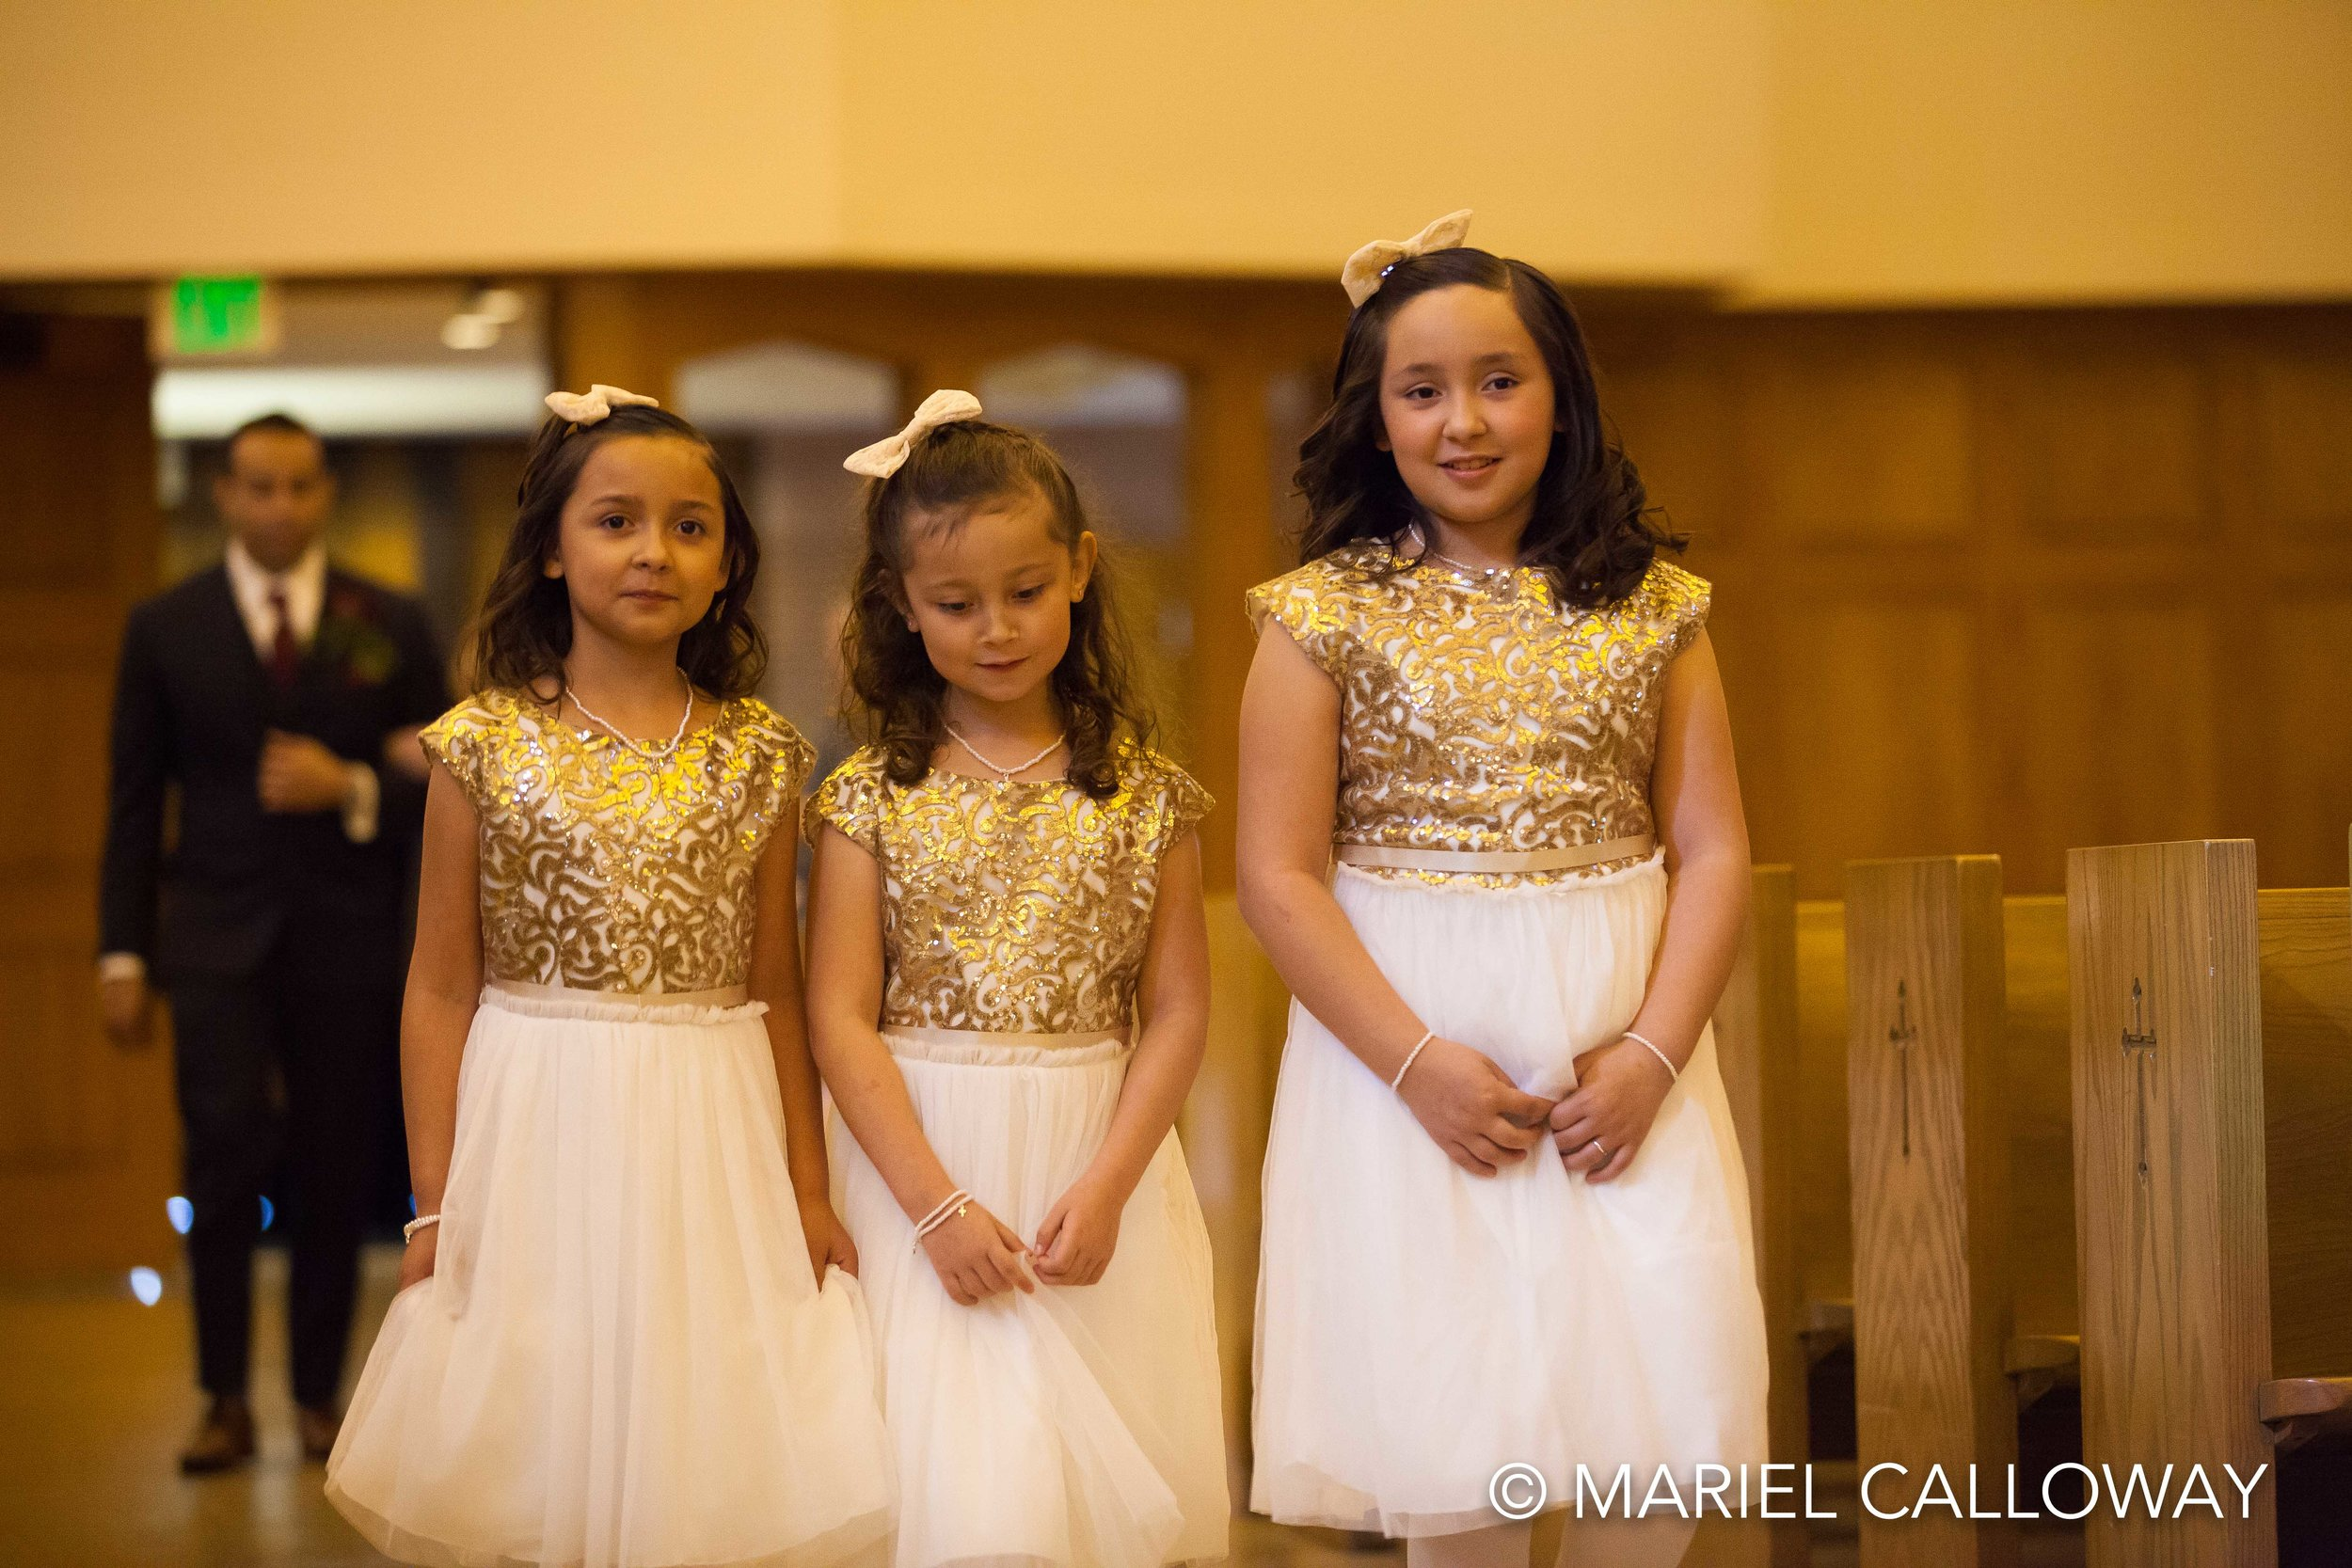 Mariel-Calloway-Los-Angeles-Wedding-Photography-Carmona-12.jpg